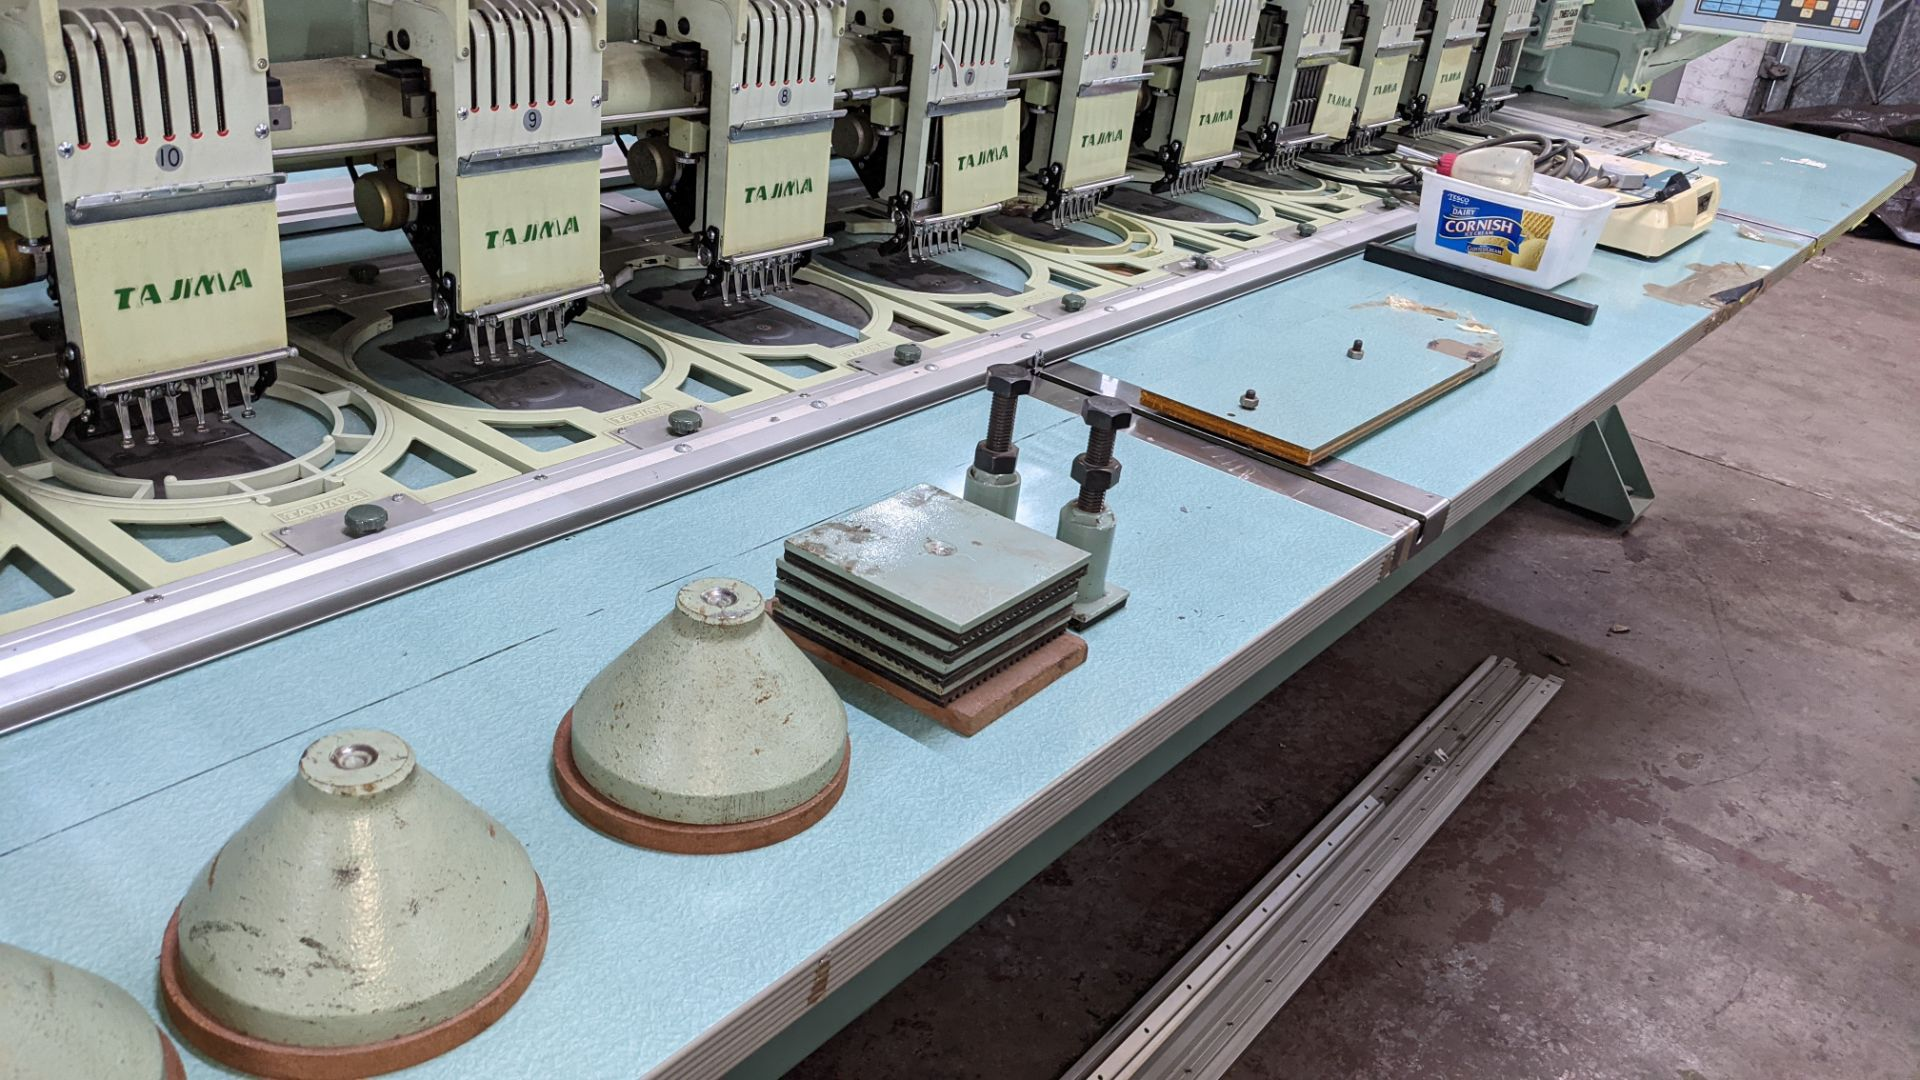 Tokai Tajima electronic 20 head automatic embroidery machine model TMEG-G620, manufacturing number 7 - Image 13 of 19